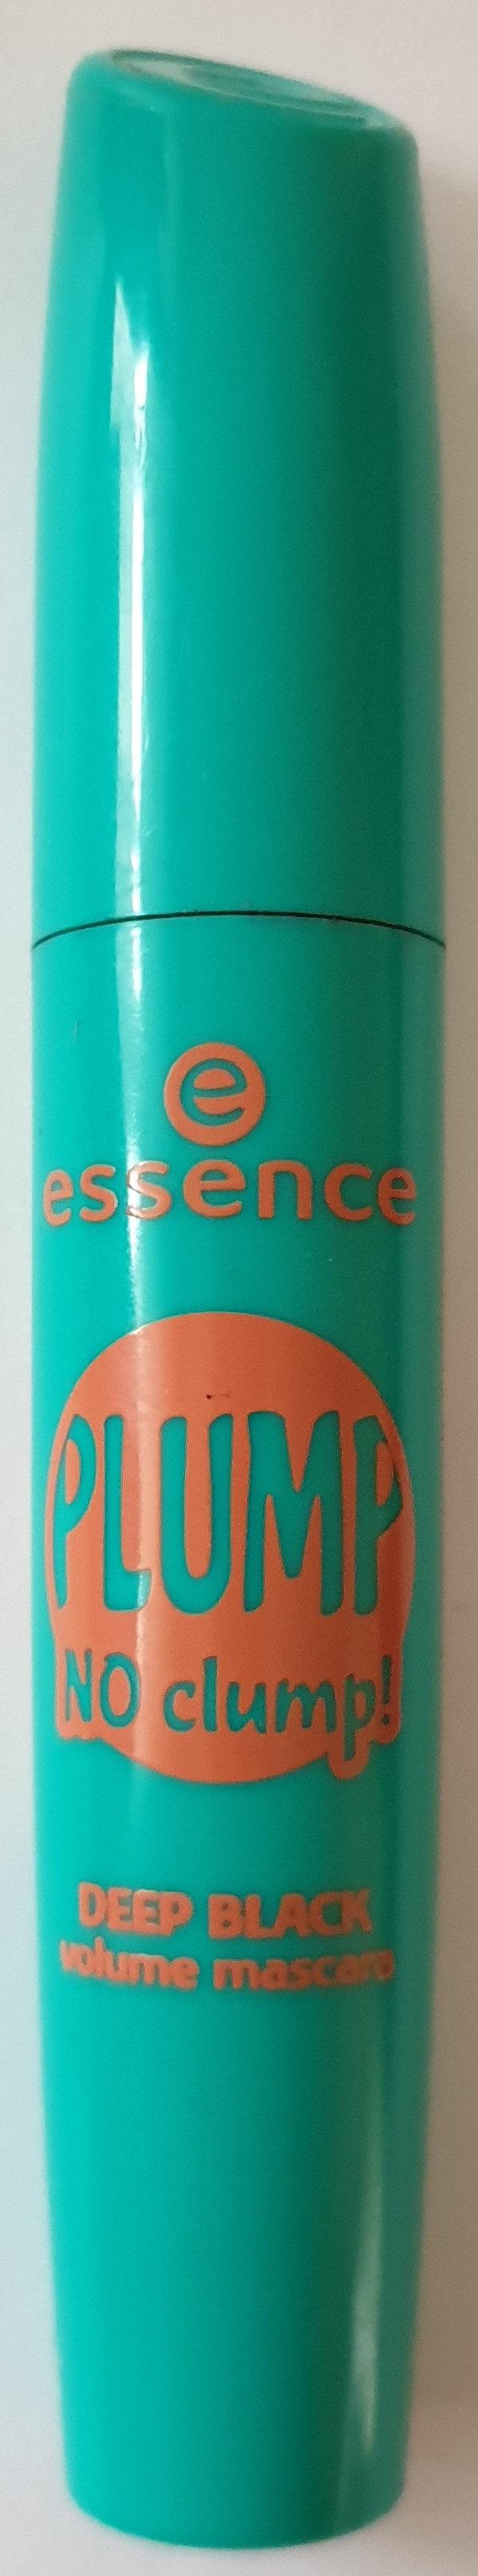 Plump no clump! Deep black volume mascara - Product - de